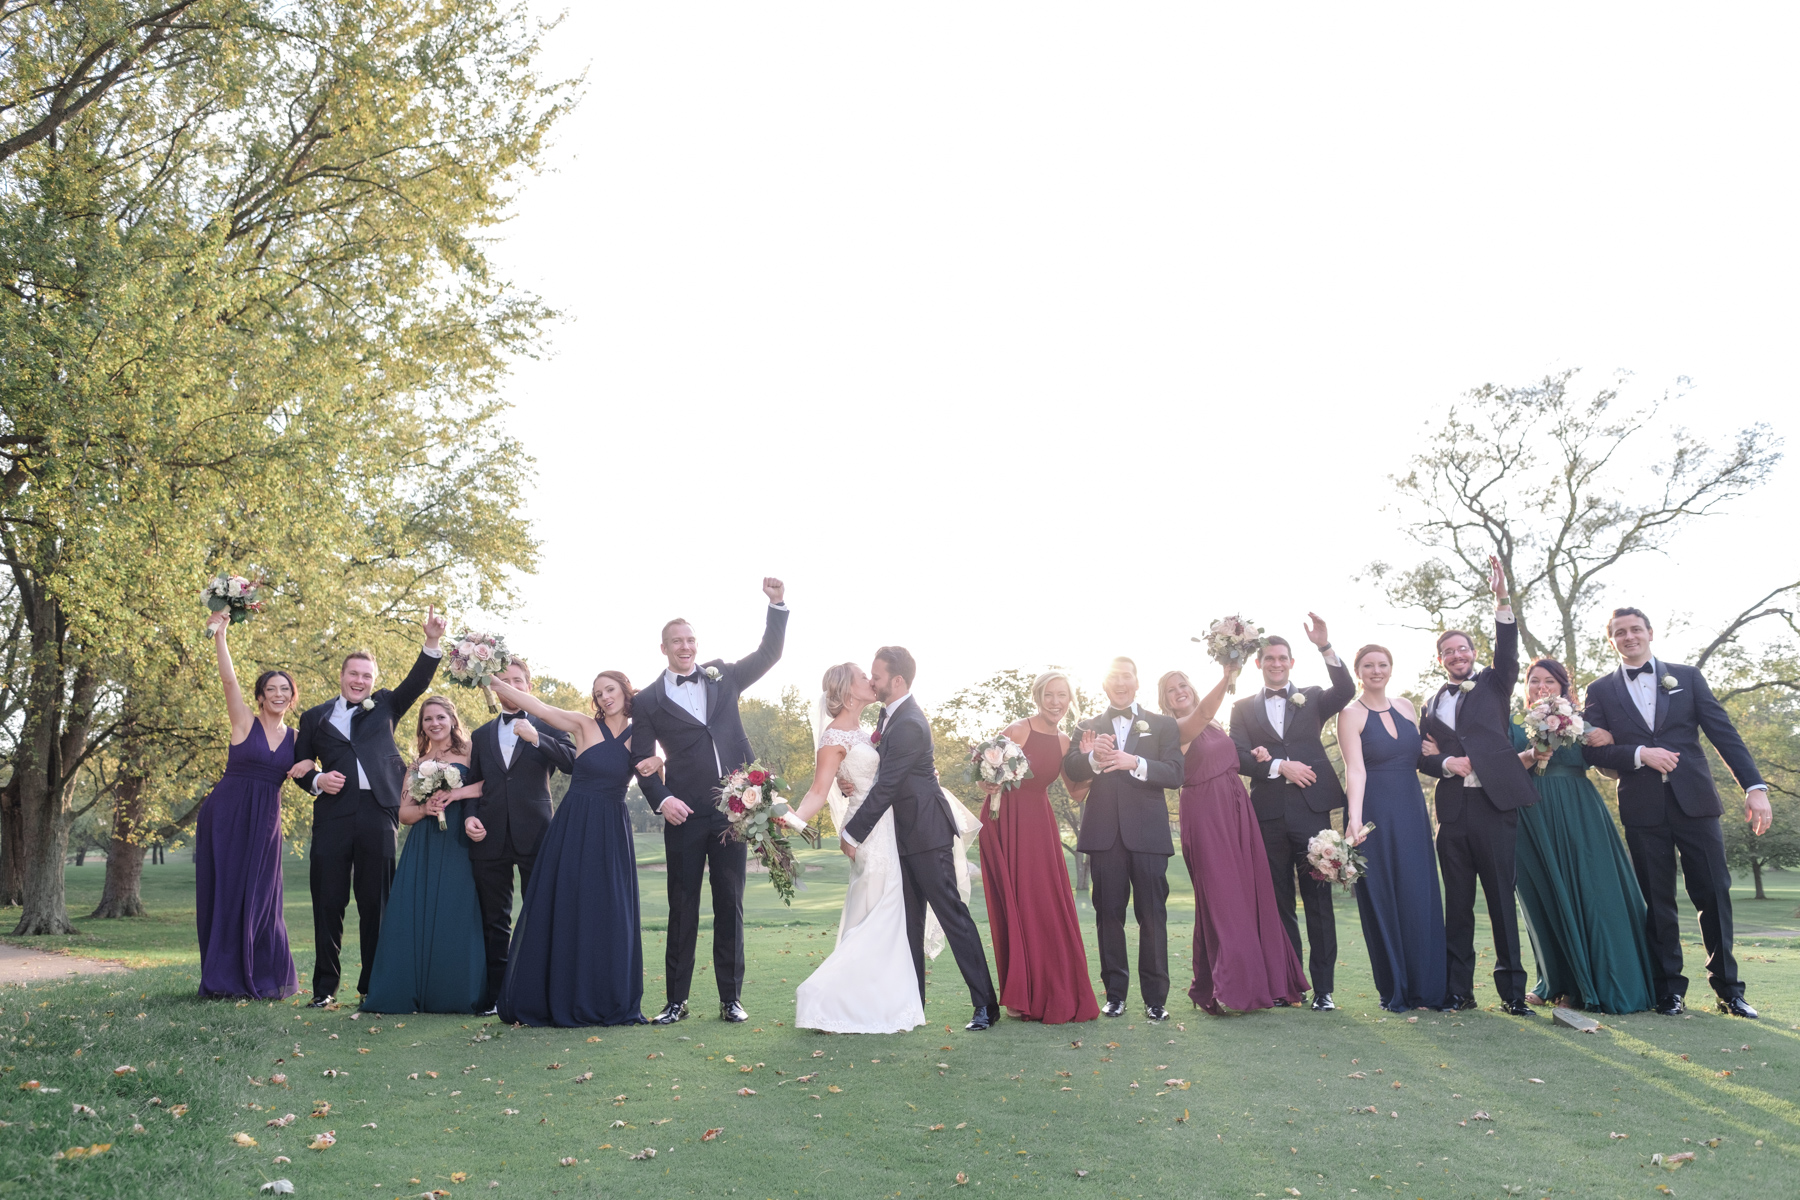 2017_BAP_KalliMatt_Gleneagles_CountryClub_Lemont_Wedding-54.jpg